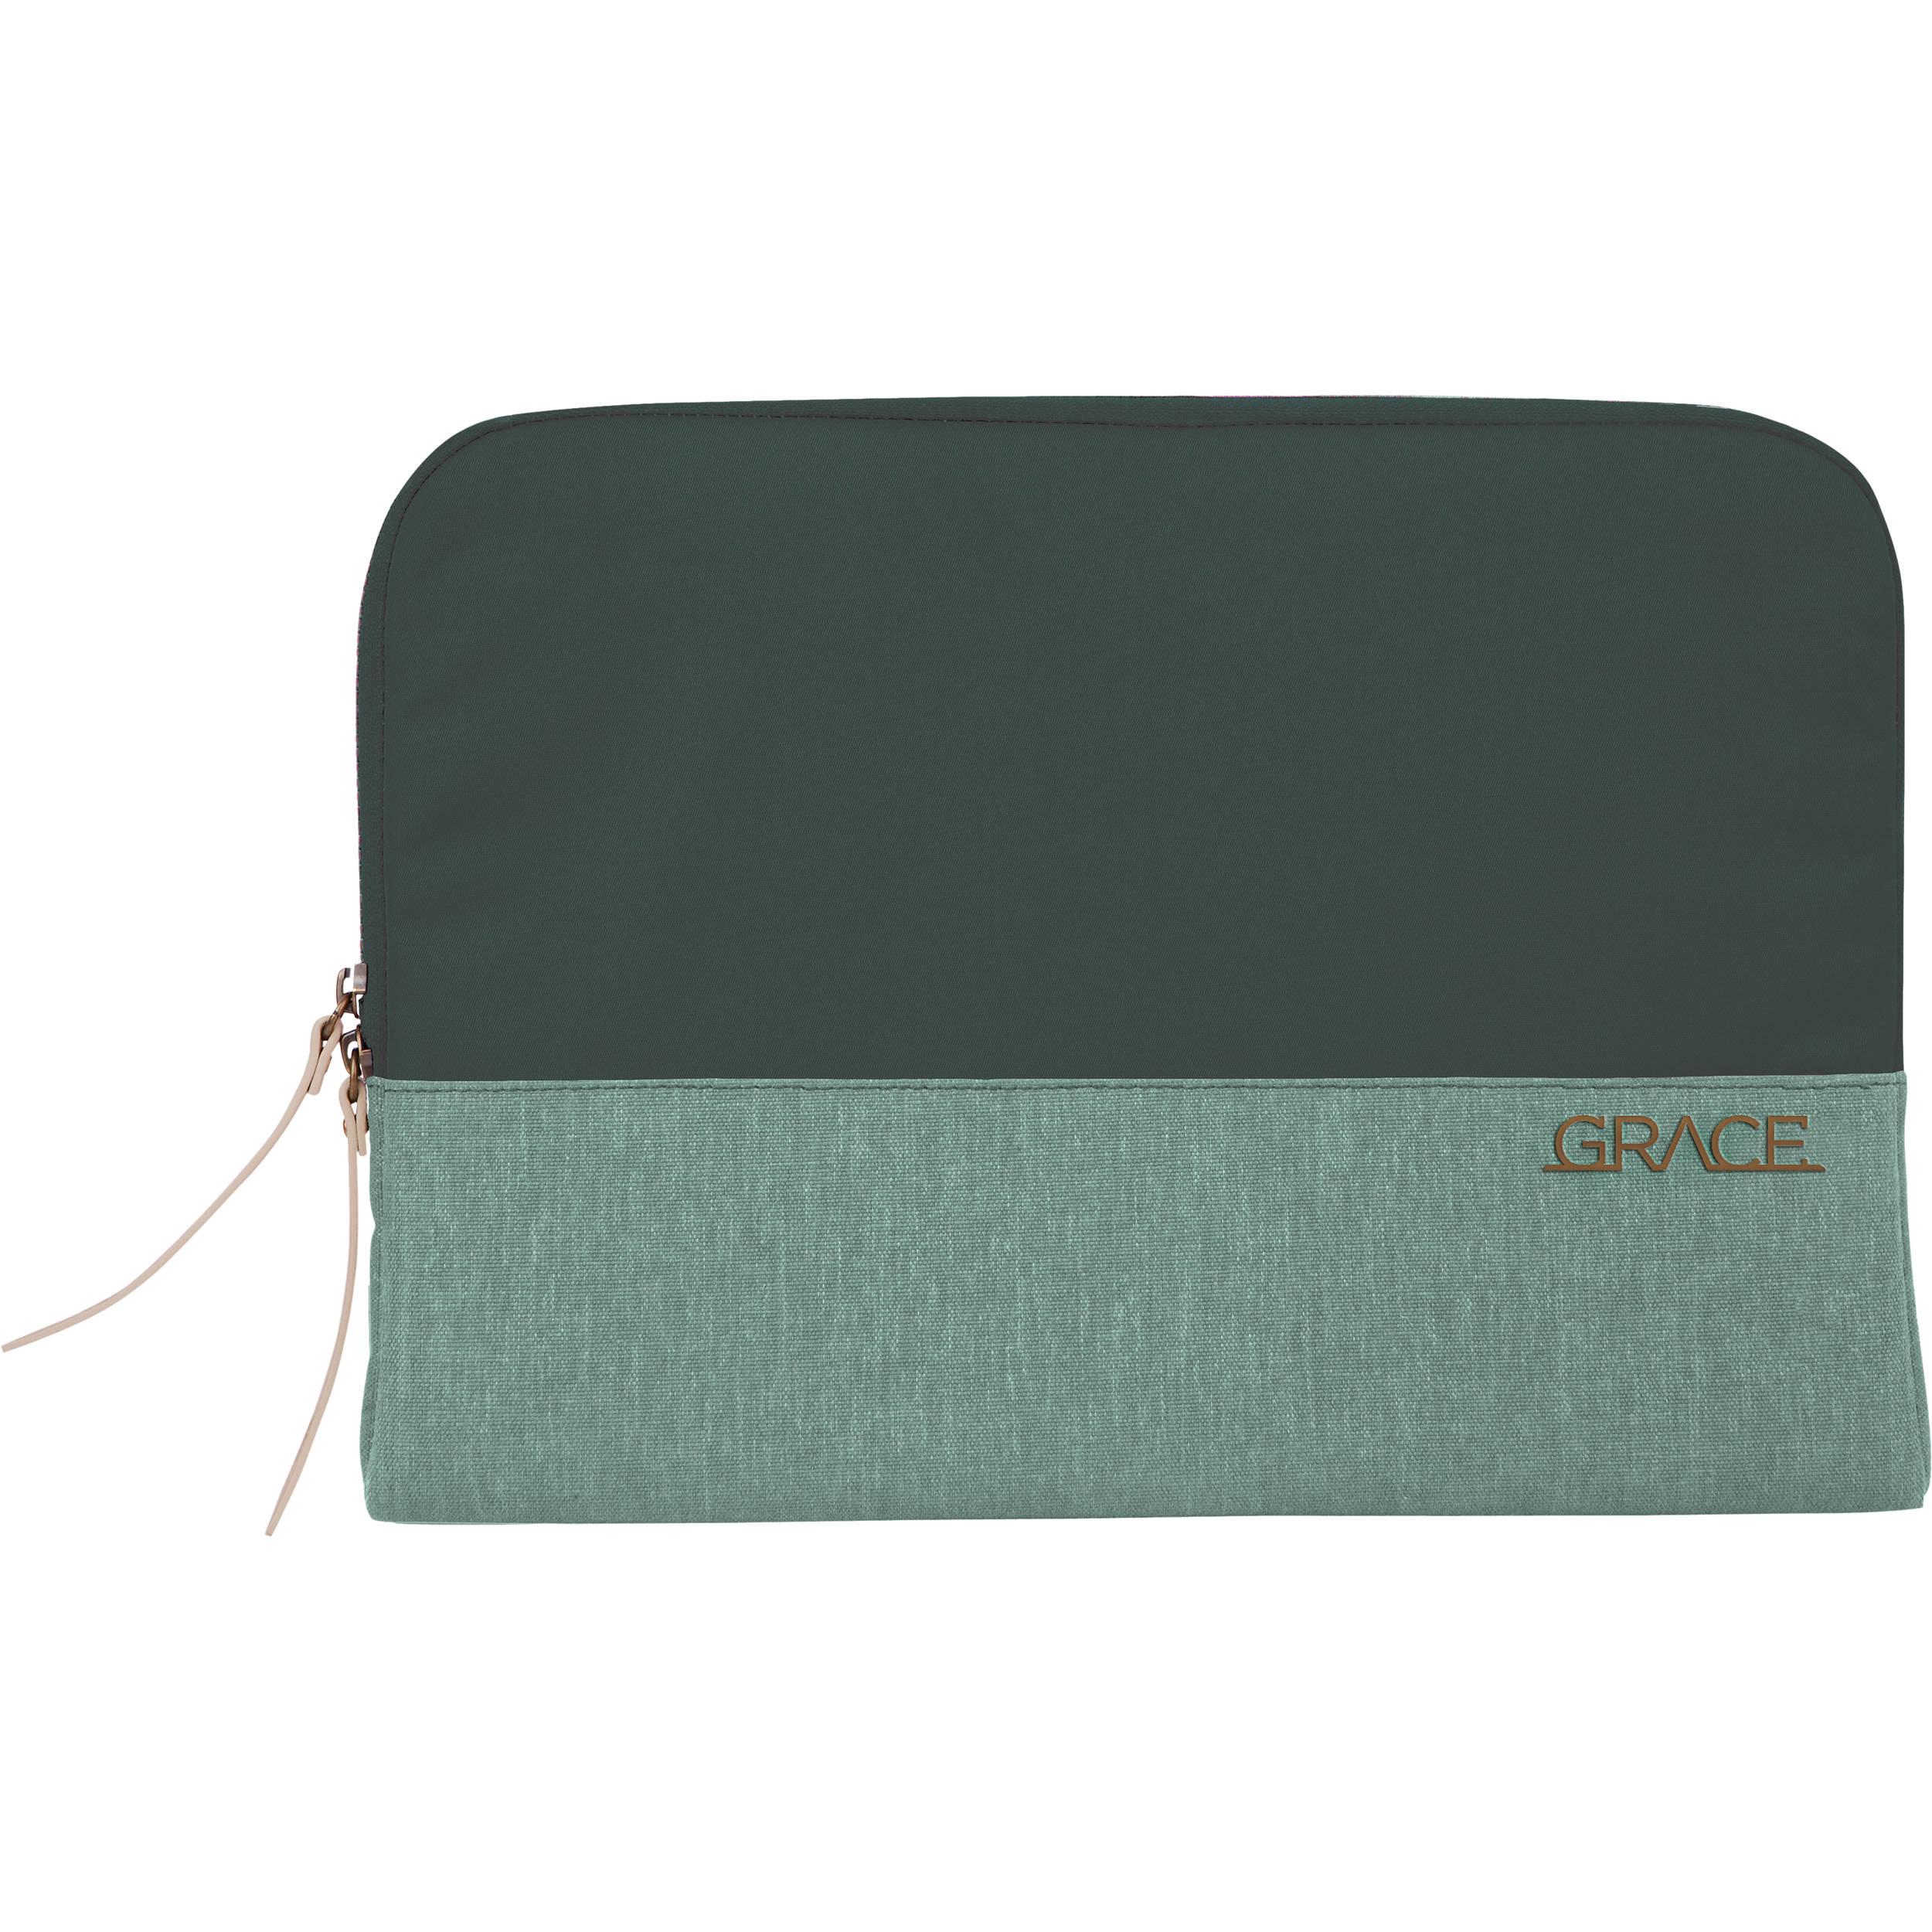 STM Grace, Woman's Laptop Sleeve for 15-Inch Laptop - Hunter Green (stm-114-106P-15)